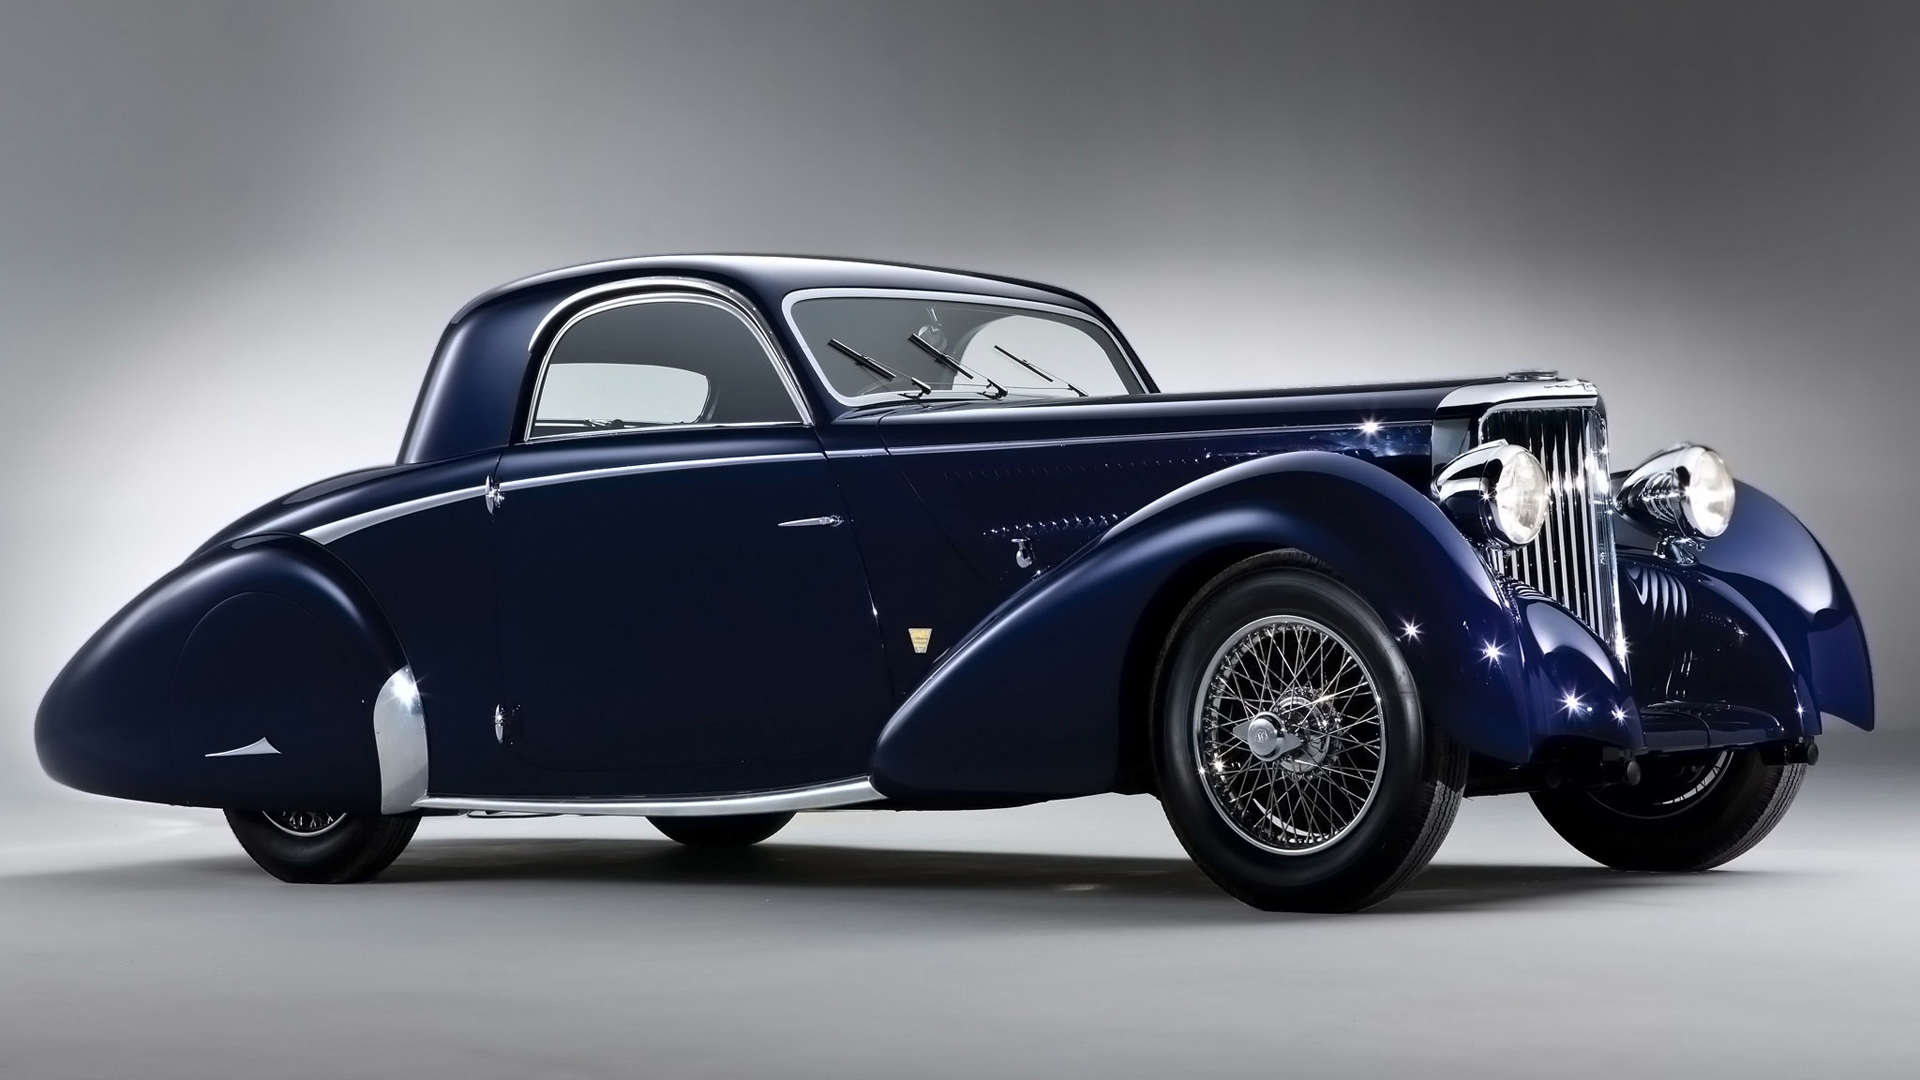 Cars Classic Car Pages Jaguar wallpapers HD   274392 1920x1080